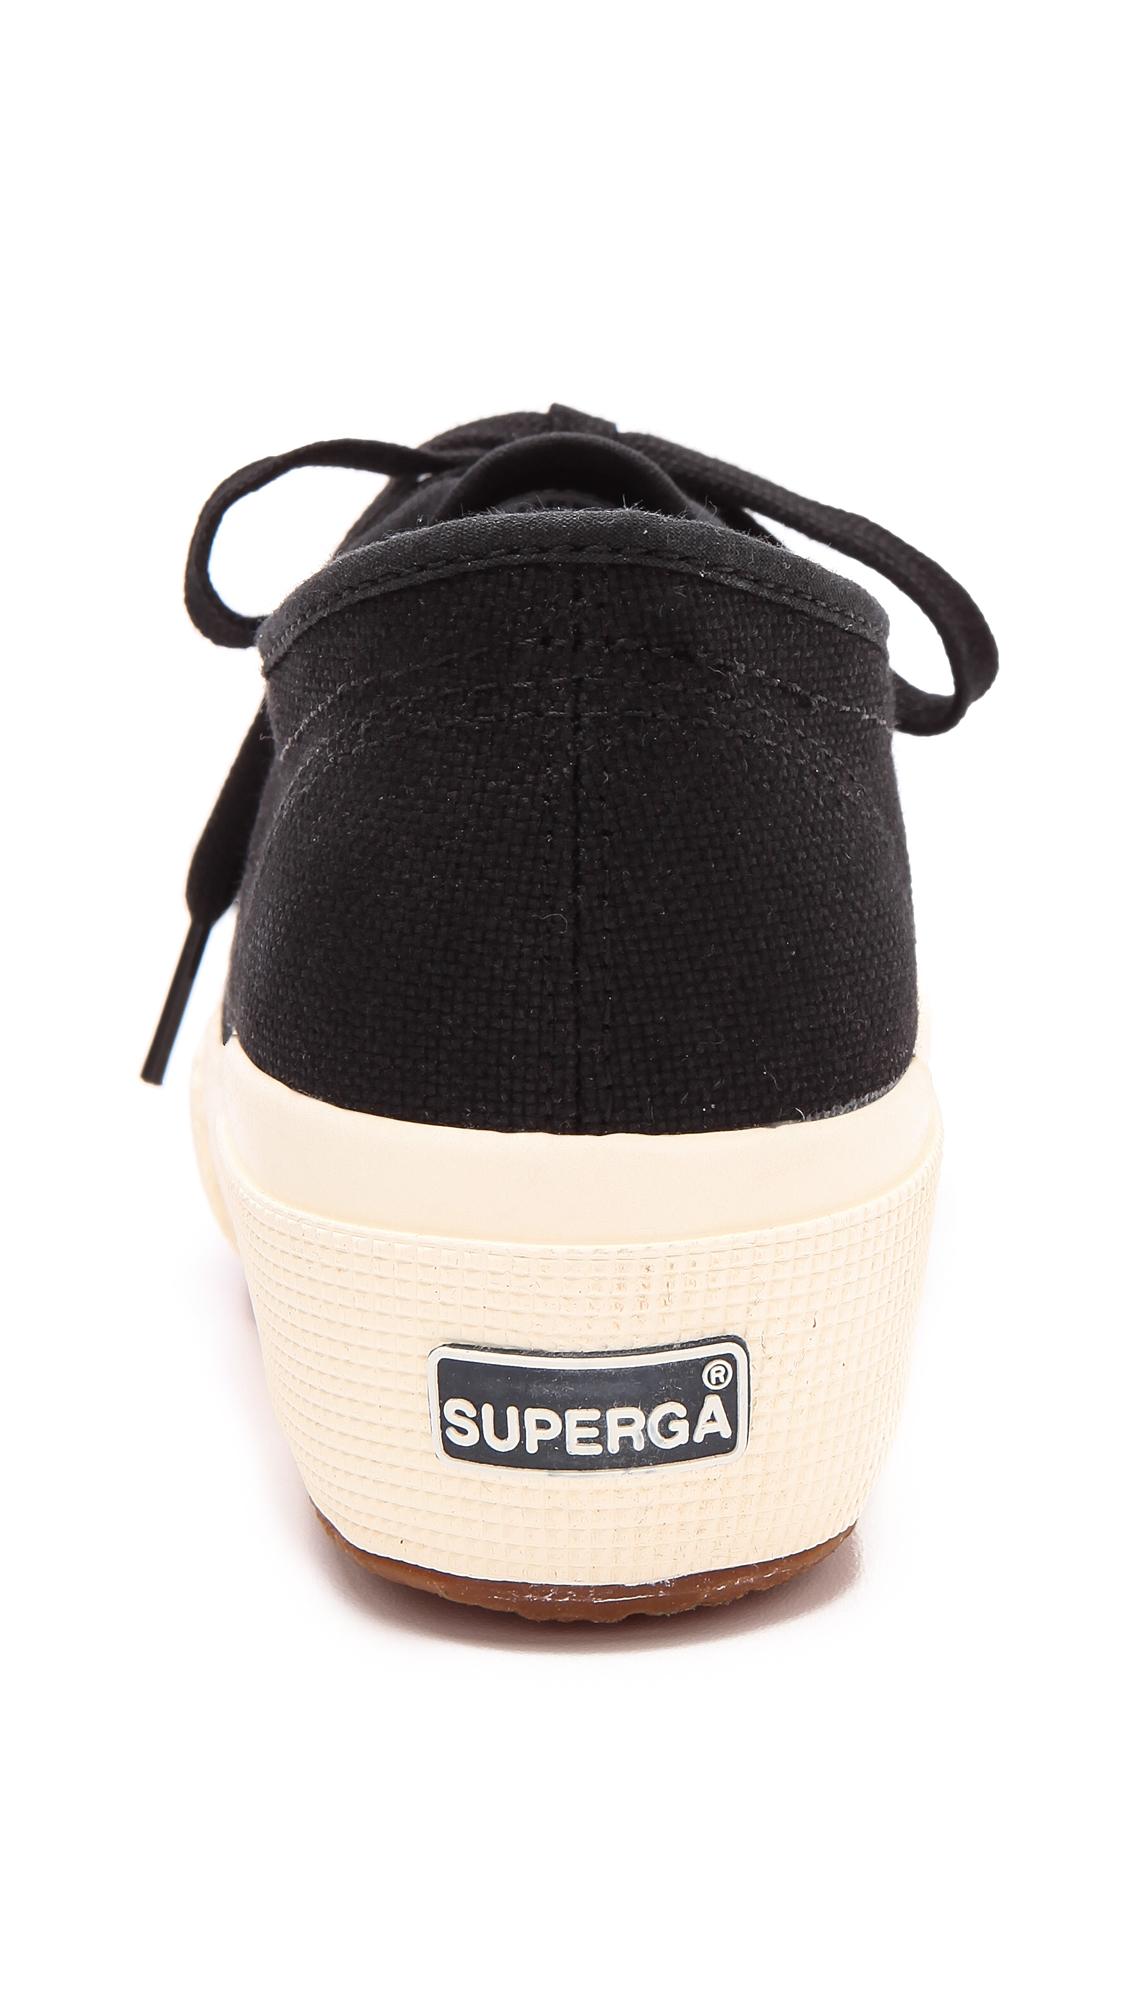 593f06e57551 Lyst - Superga Cotu Wedge Sneakers - White in Black